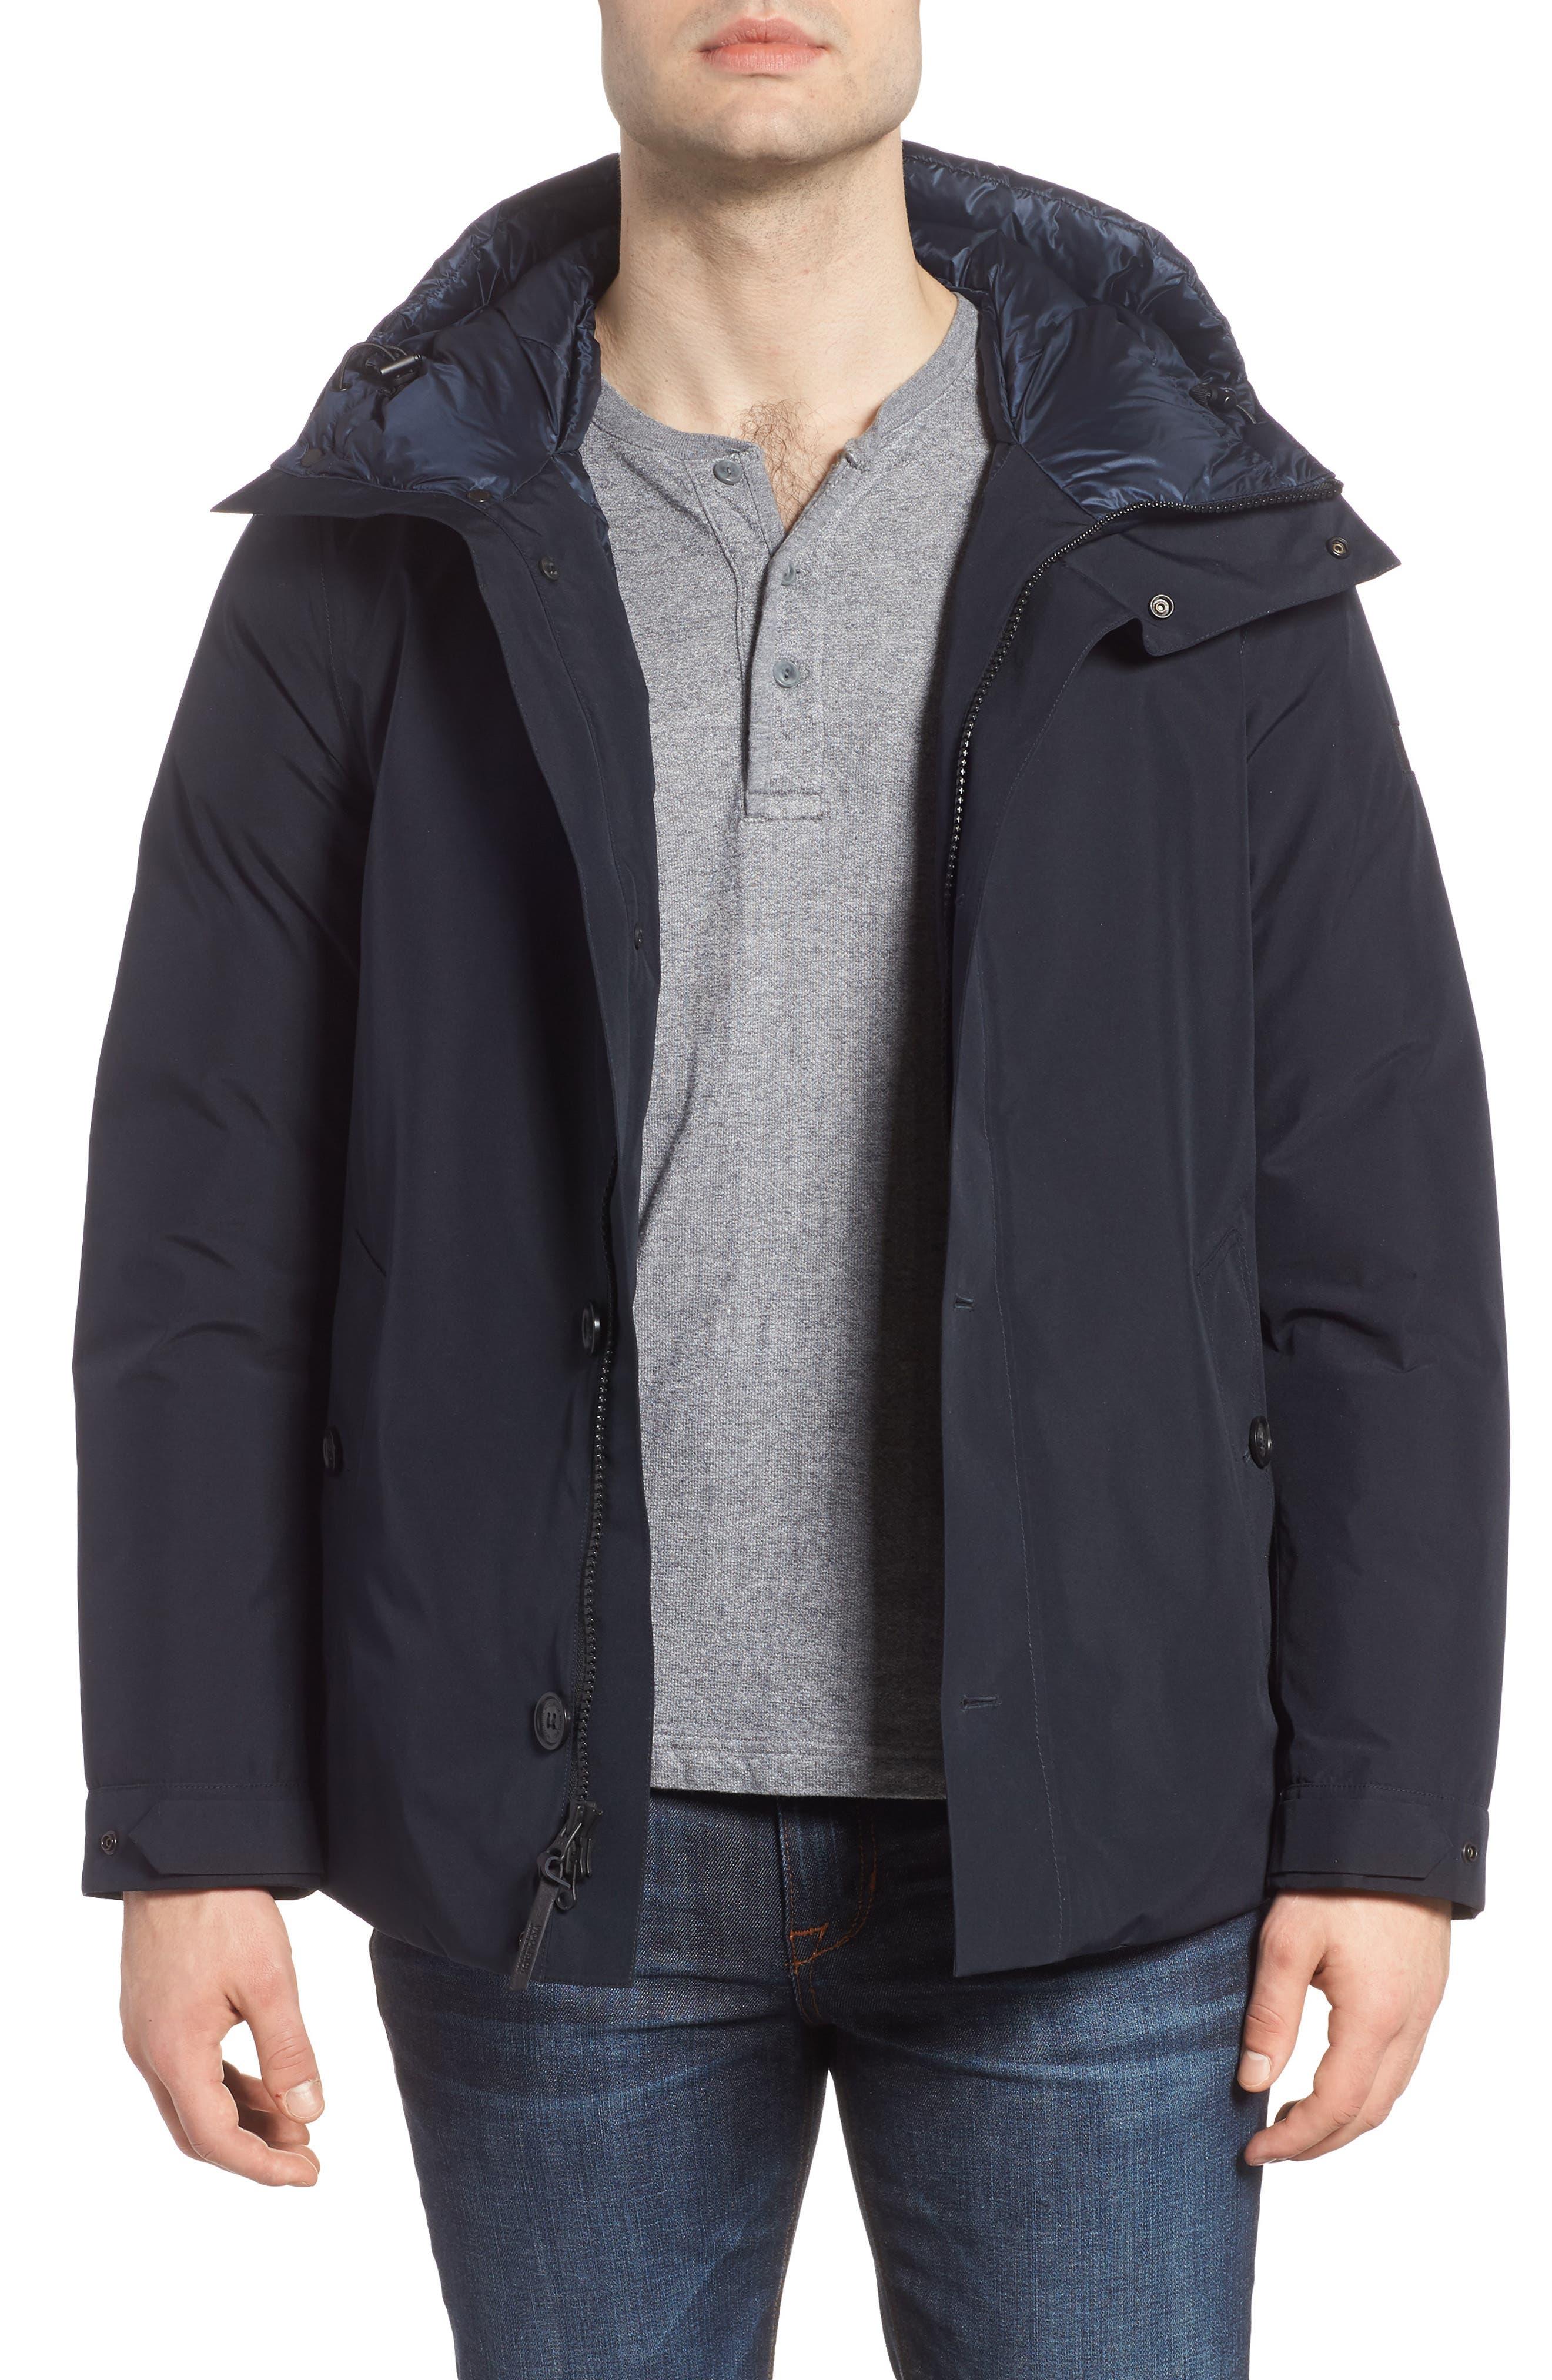 Waterproof Gore-Tex<sup>®</sup> Alpine Jacket,                             Main thumbnail 1, color,                             NAVY MELTON